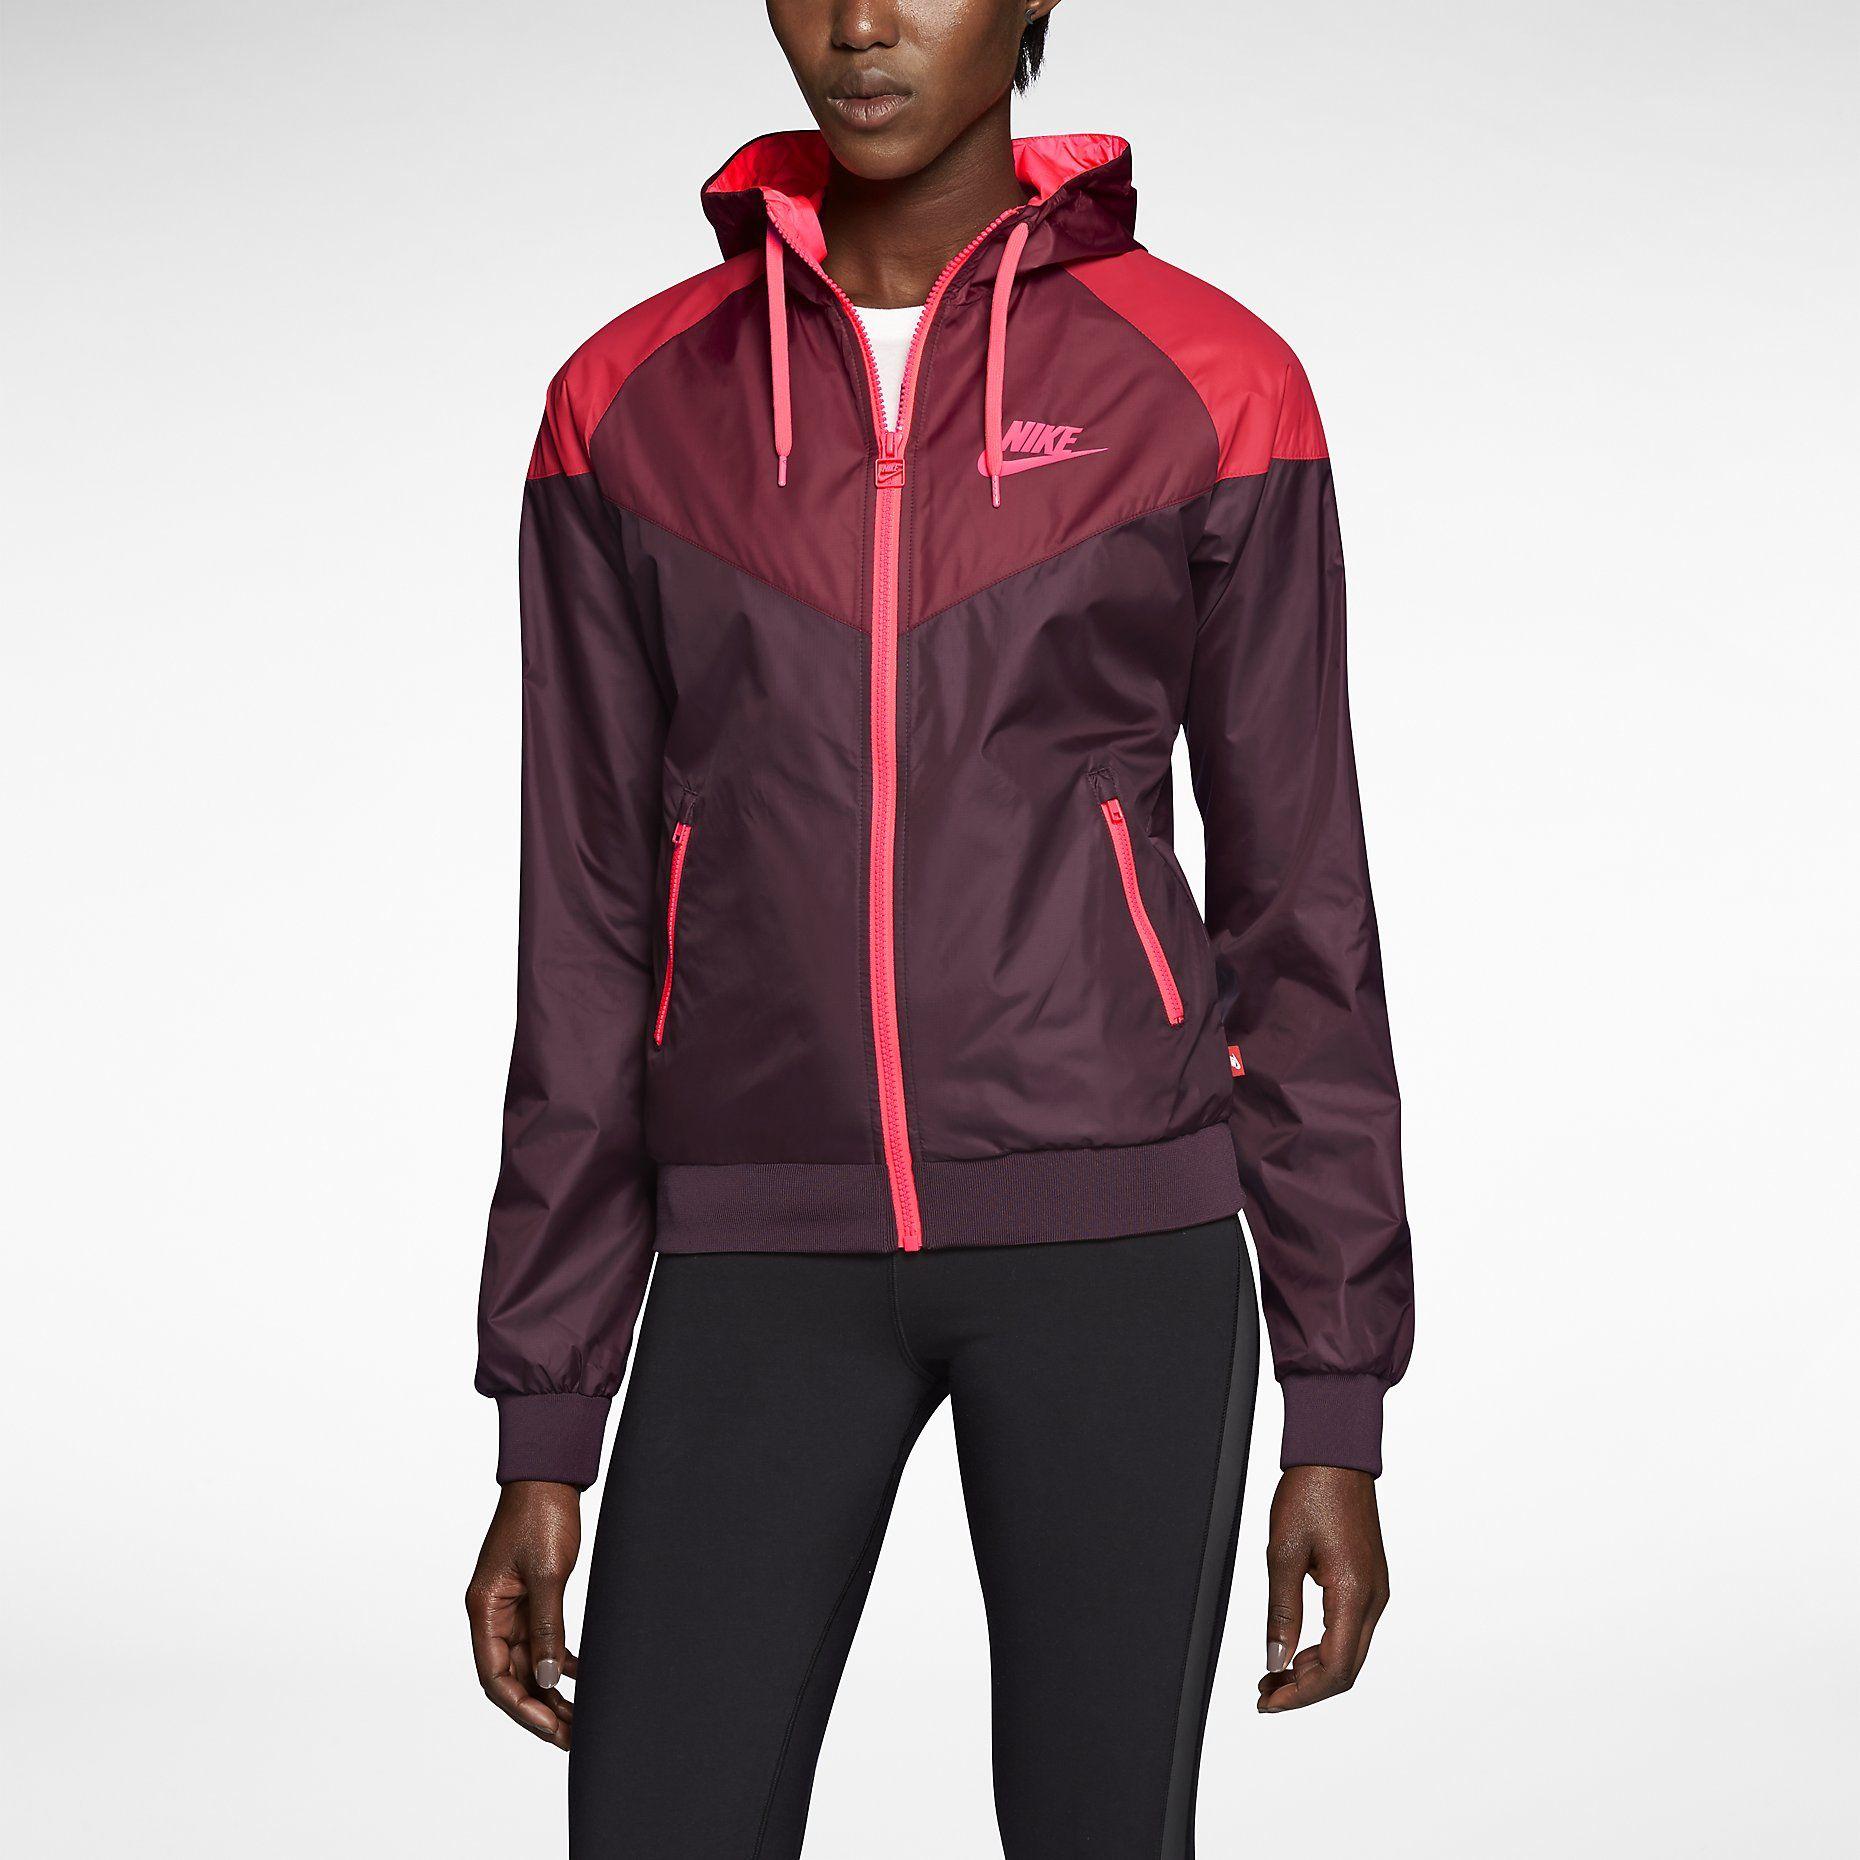 Nike jacken bedrucken